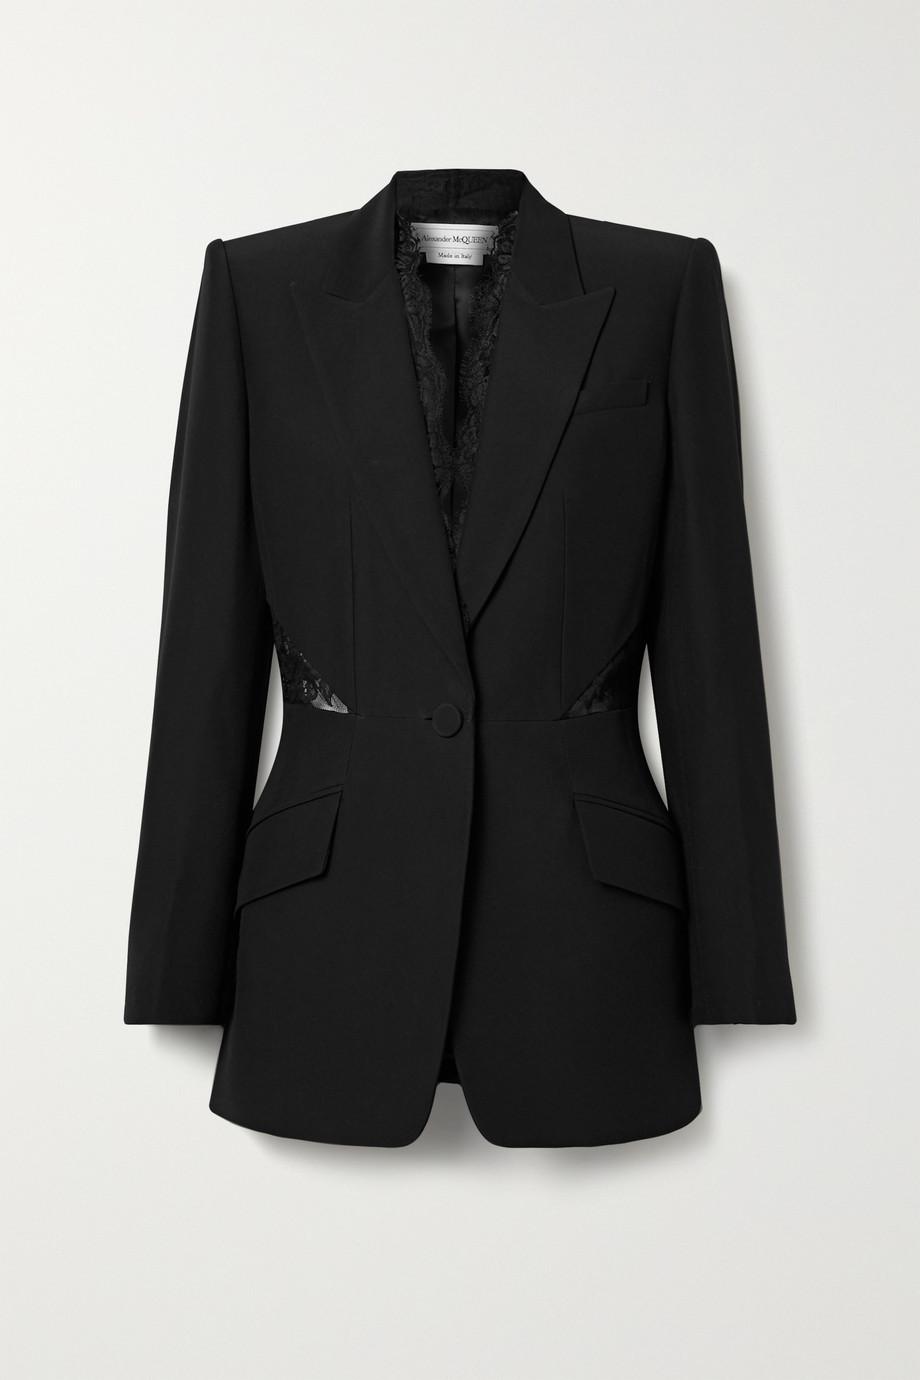 Alexander McQueen Lace-paneled crepe blazer